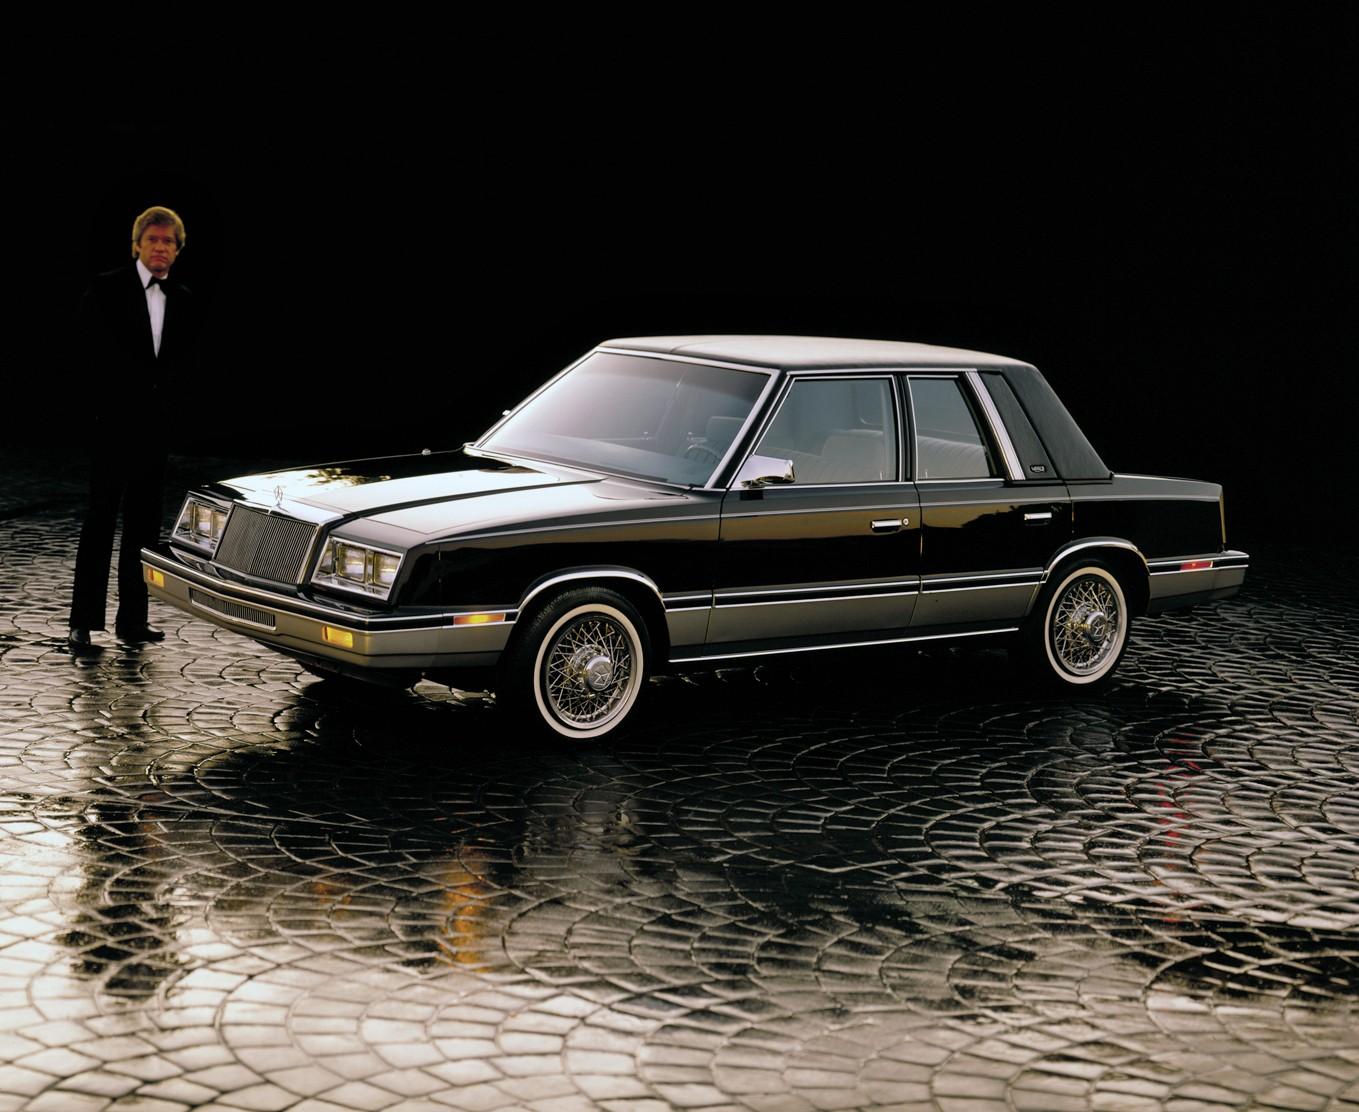 chrysler lebaron sedan 1982 1988 cars 1983 1985 1986 1984 autoevolution specs 1987